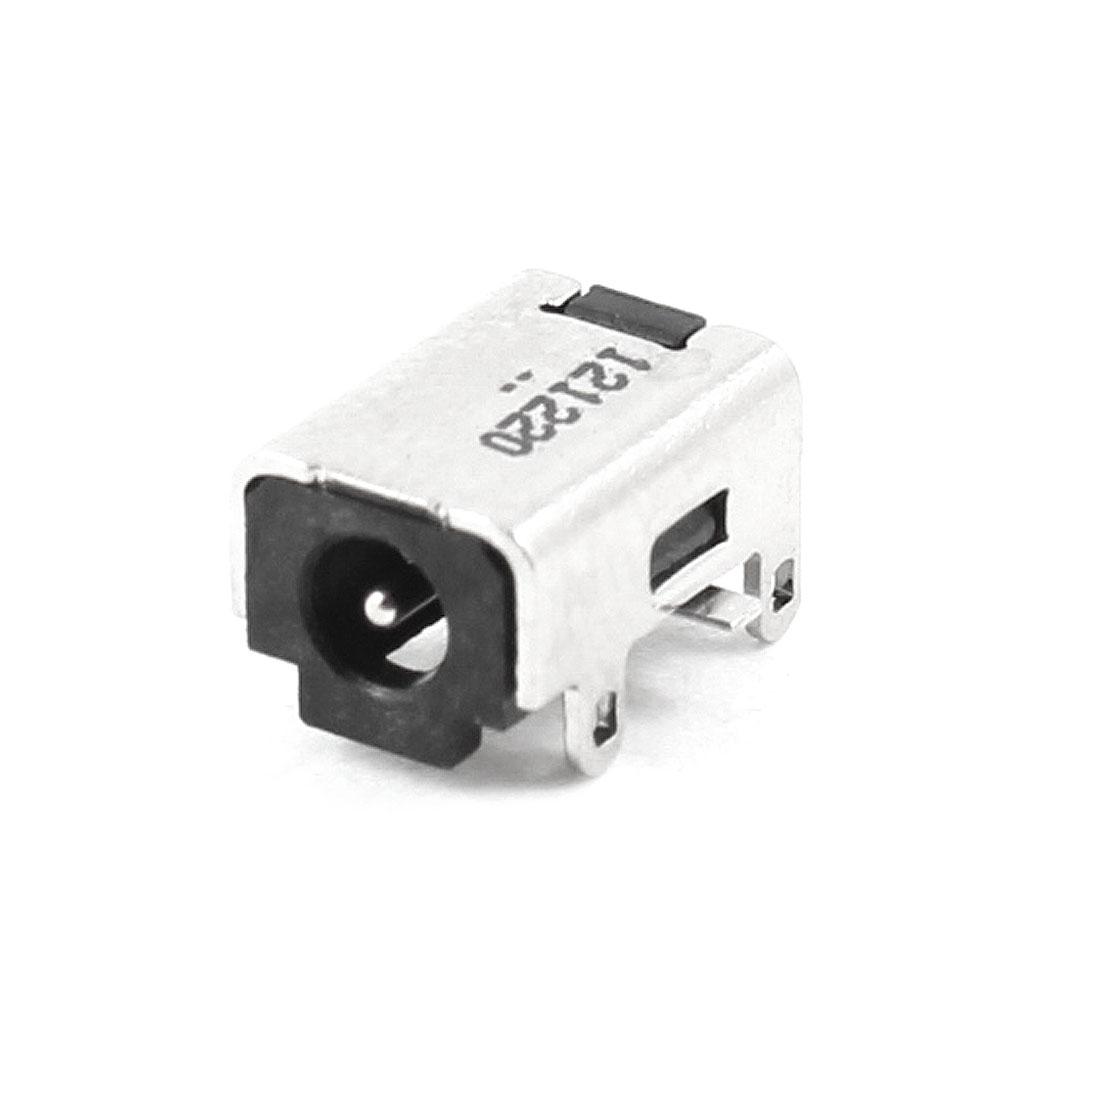 DC Power Jack Plug Socket PJ486 for Asus EEE PC 1001PQ 1001PQD 1001PX Notebooks